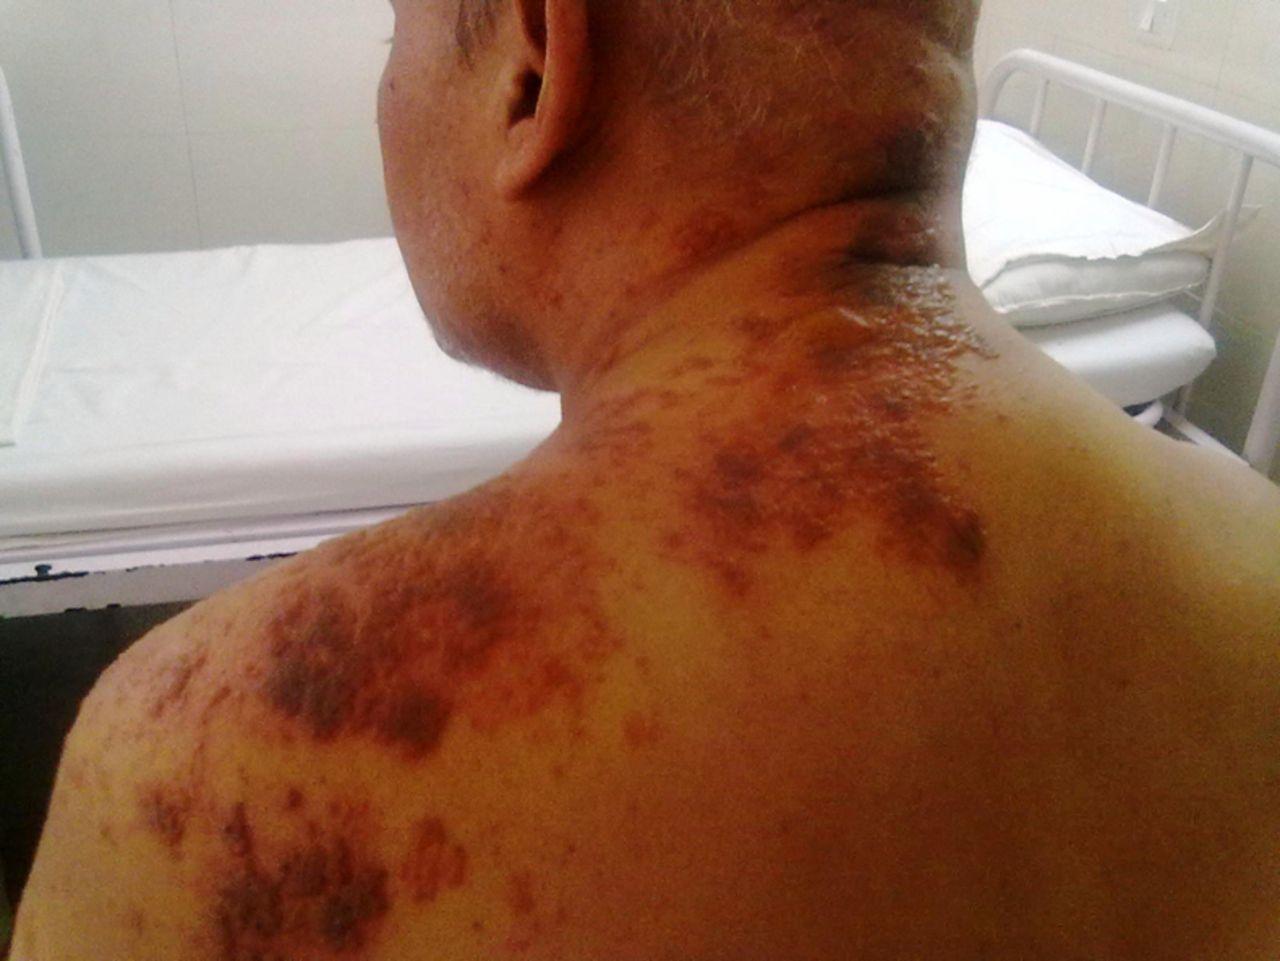 Multidermatomal Herpes Zoster Bmj Case Reports